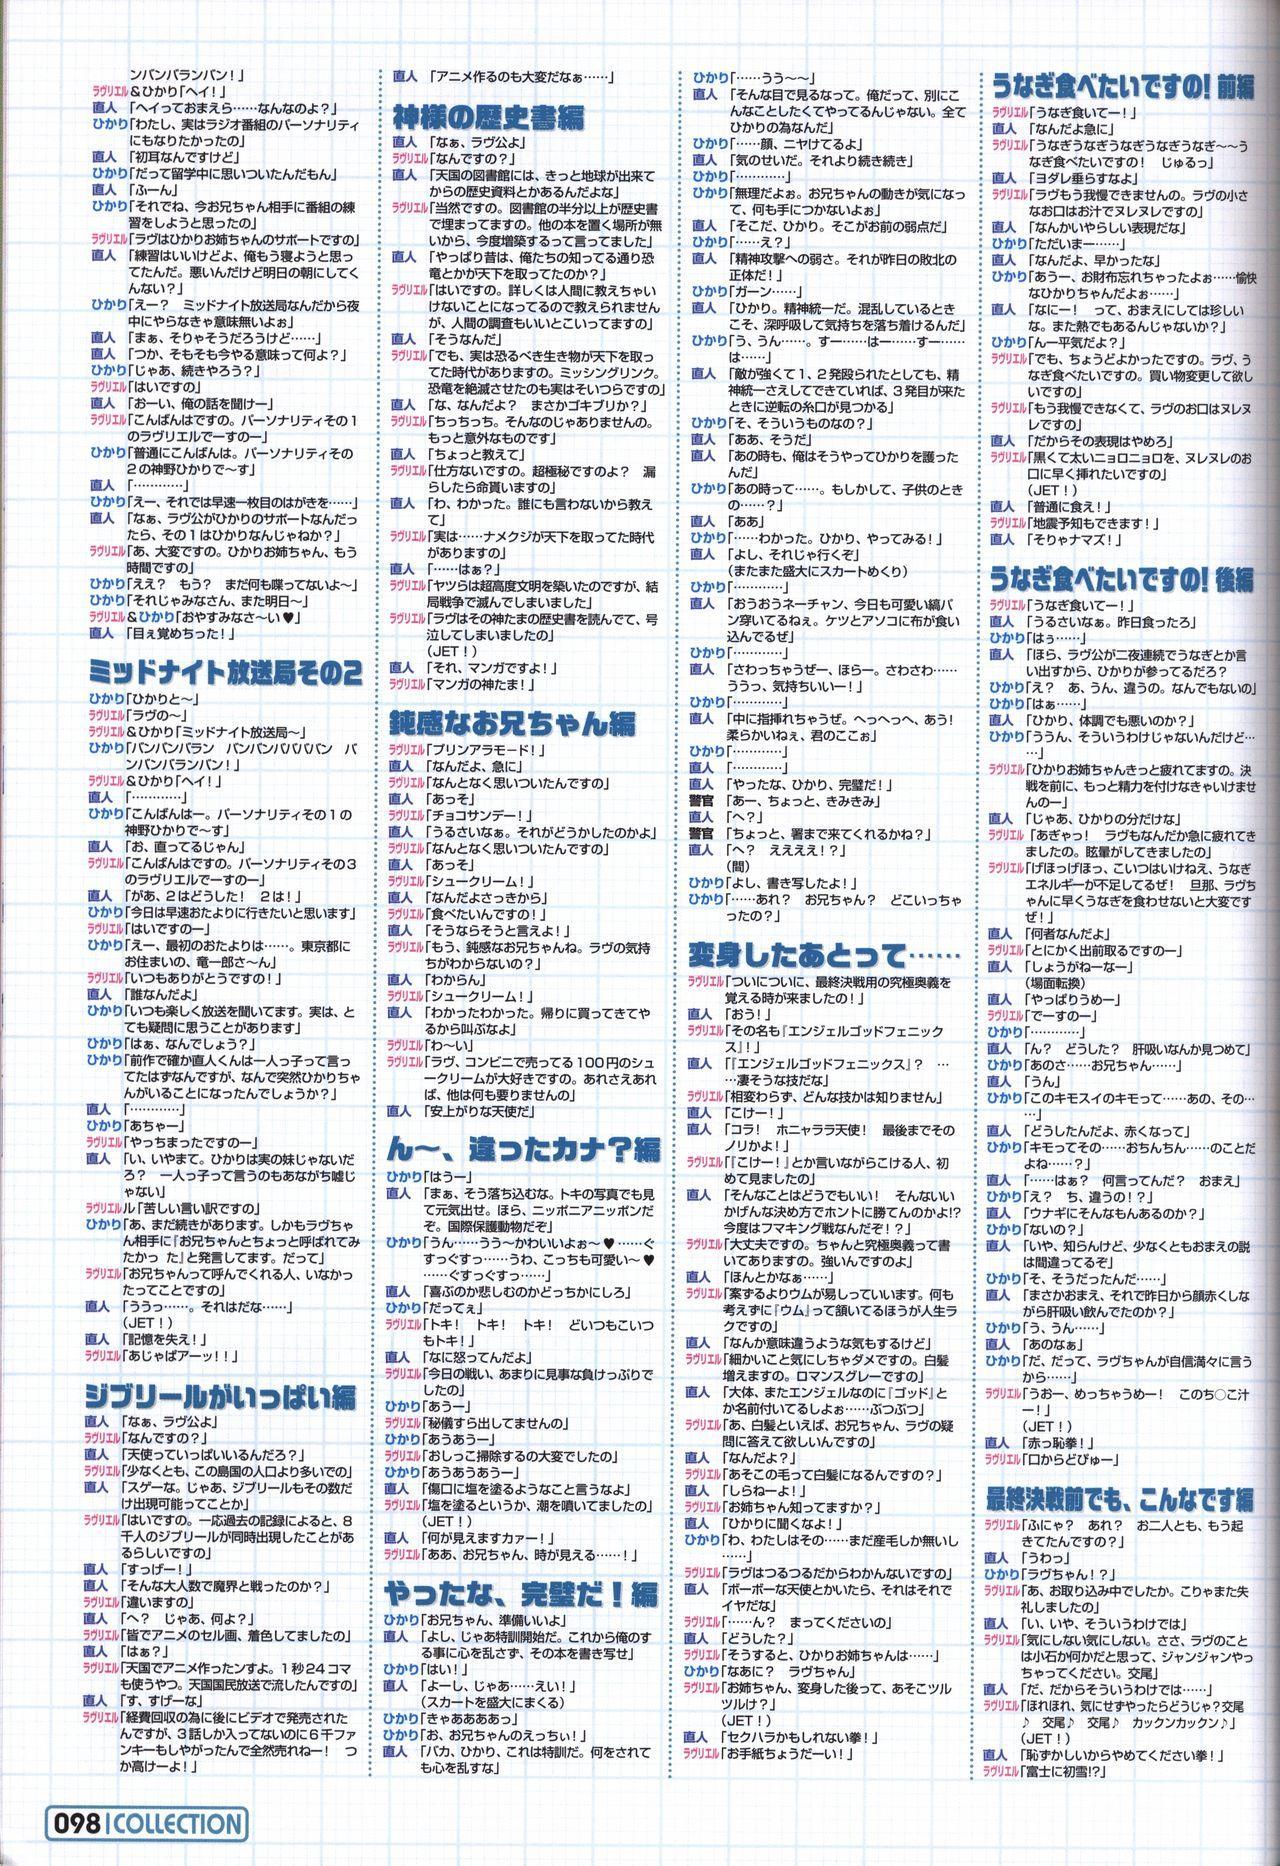 Makai Tenshi Jibril~EPISODE 2~ official fanbook 94